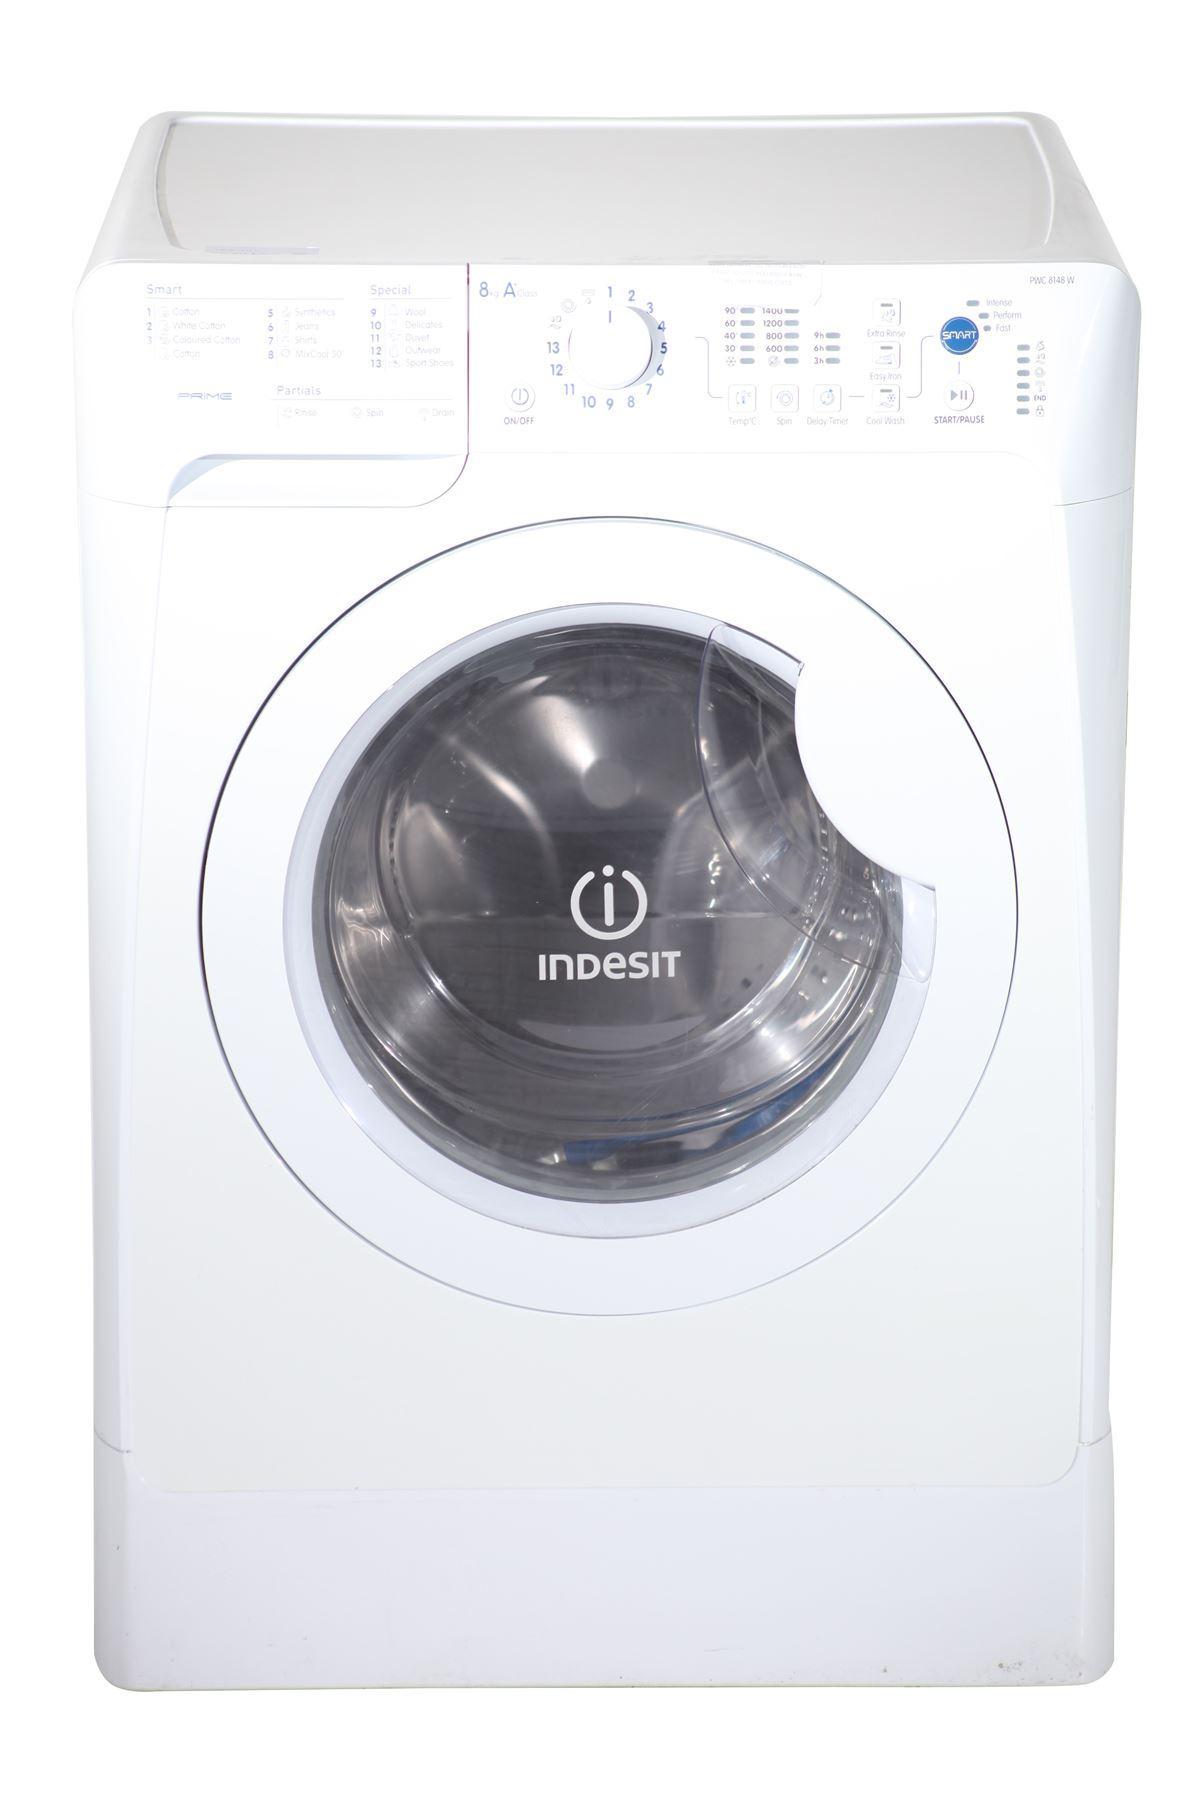 indesit 8kg washing machine pwc8148wuk white online store. Black Bedroom Furniture Sets. Home Design Ideas